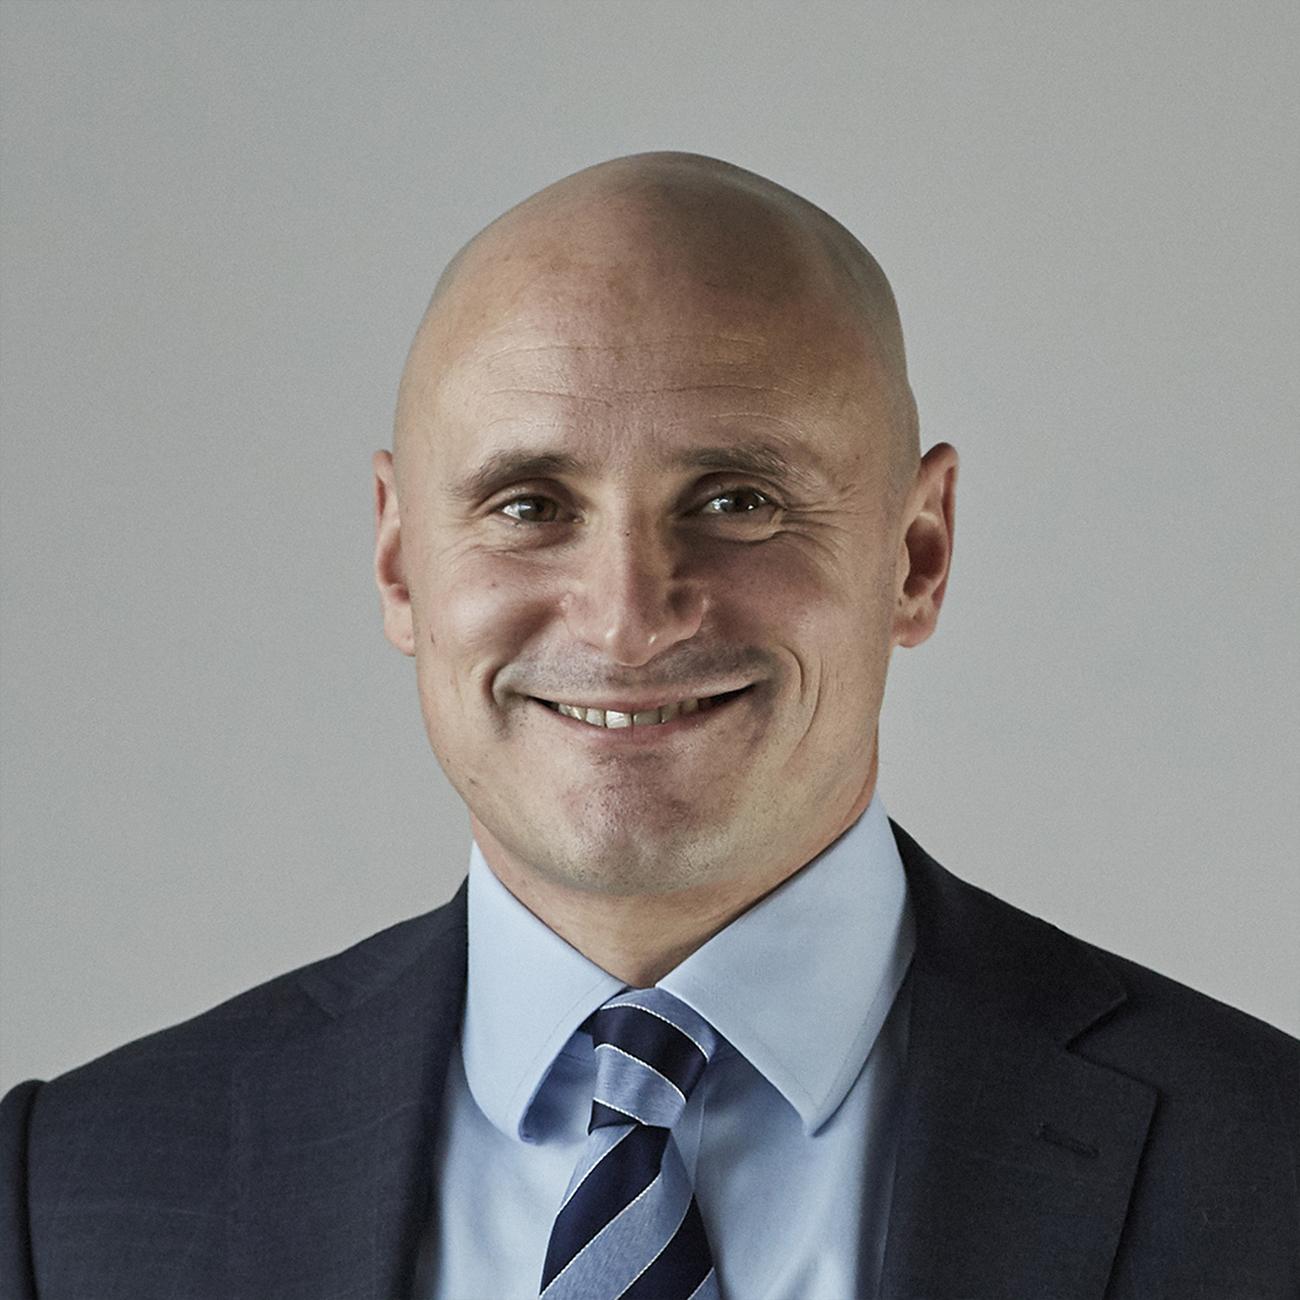 Mark Wilangowski